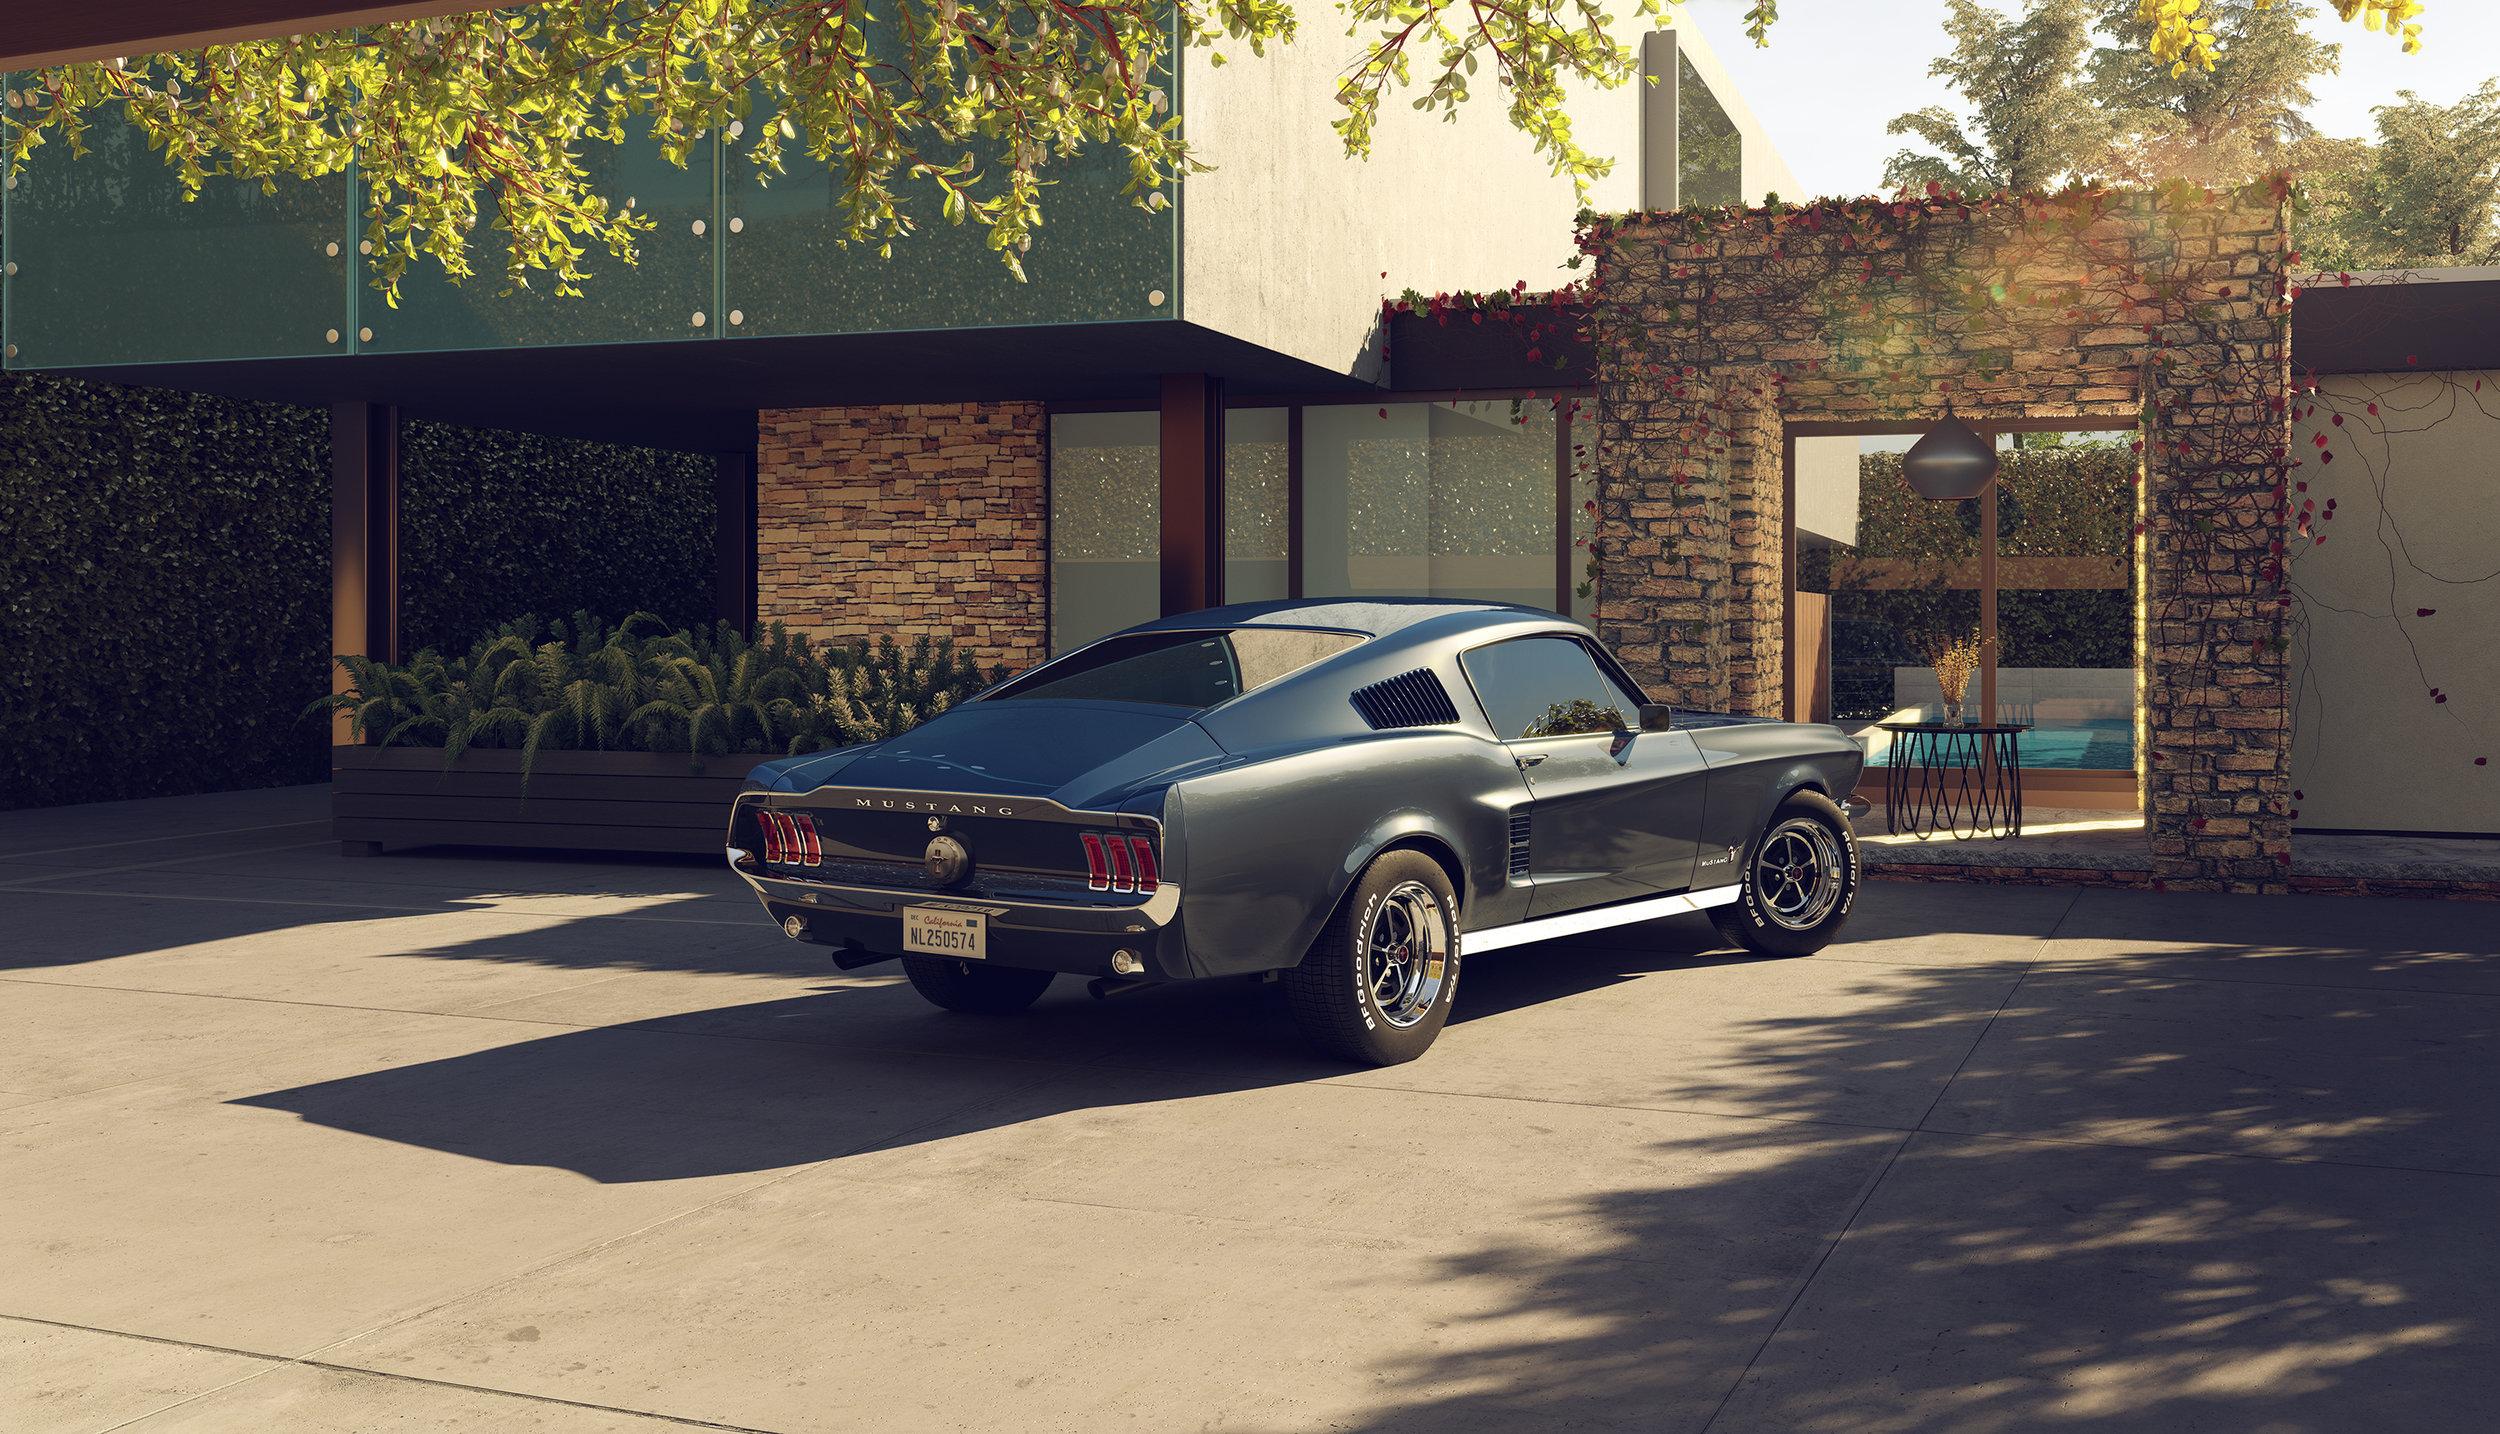 Mustang_House.jpg